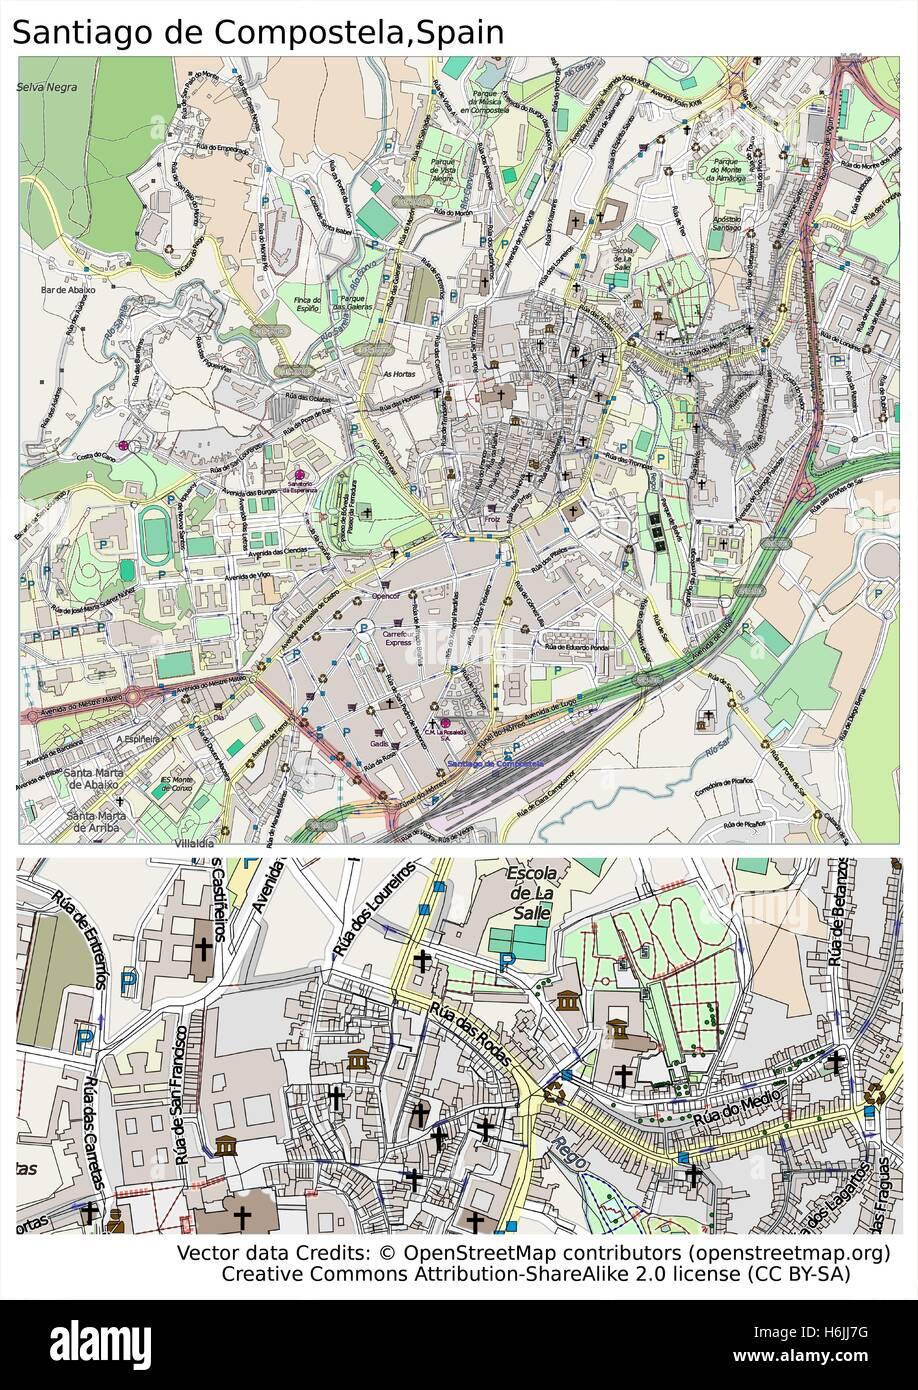 Santiago De Compostela Spain City Map Stock Vector Art